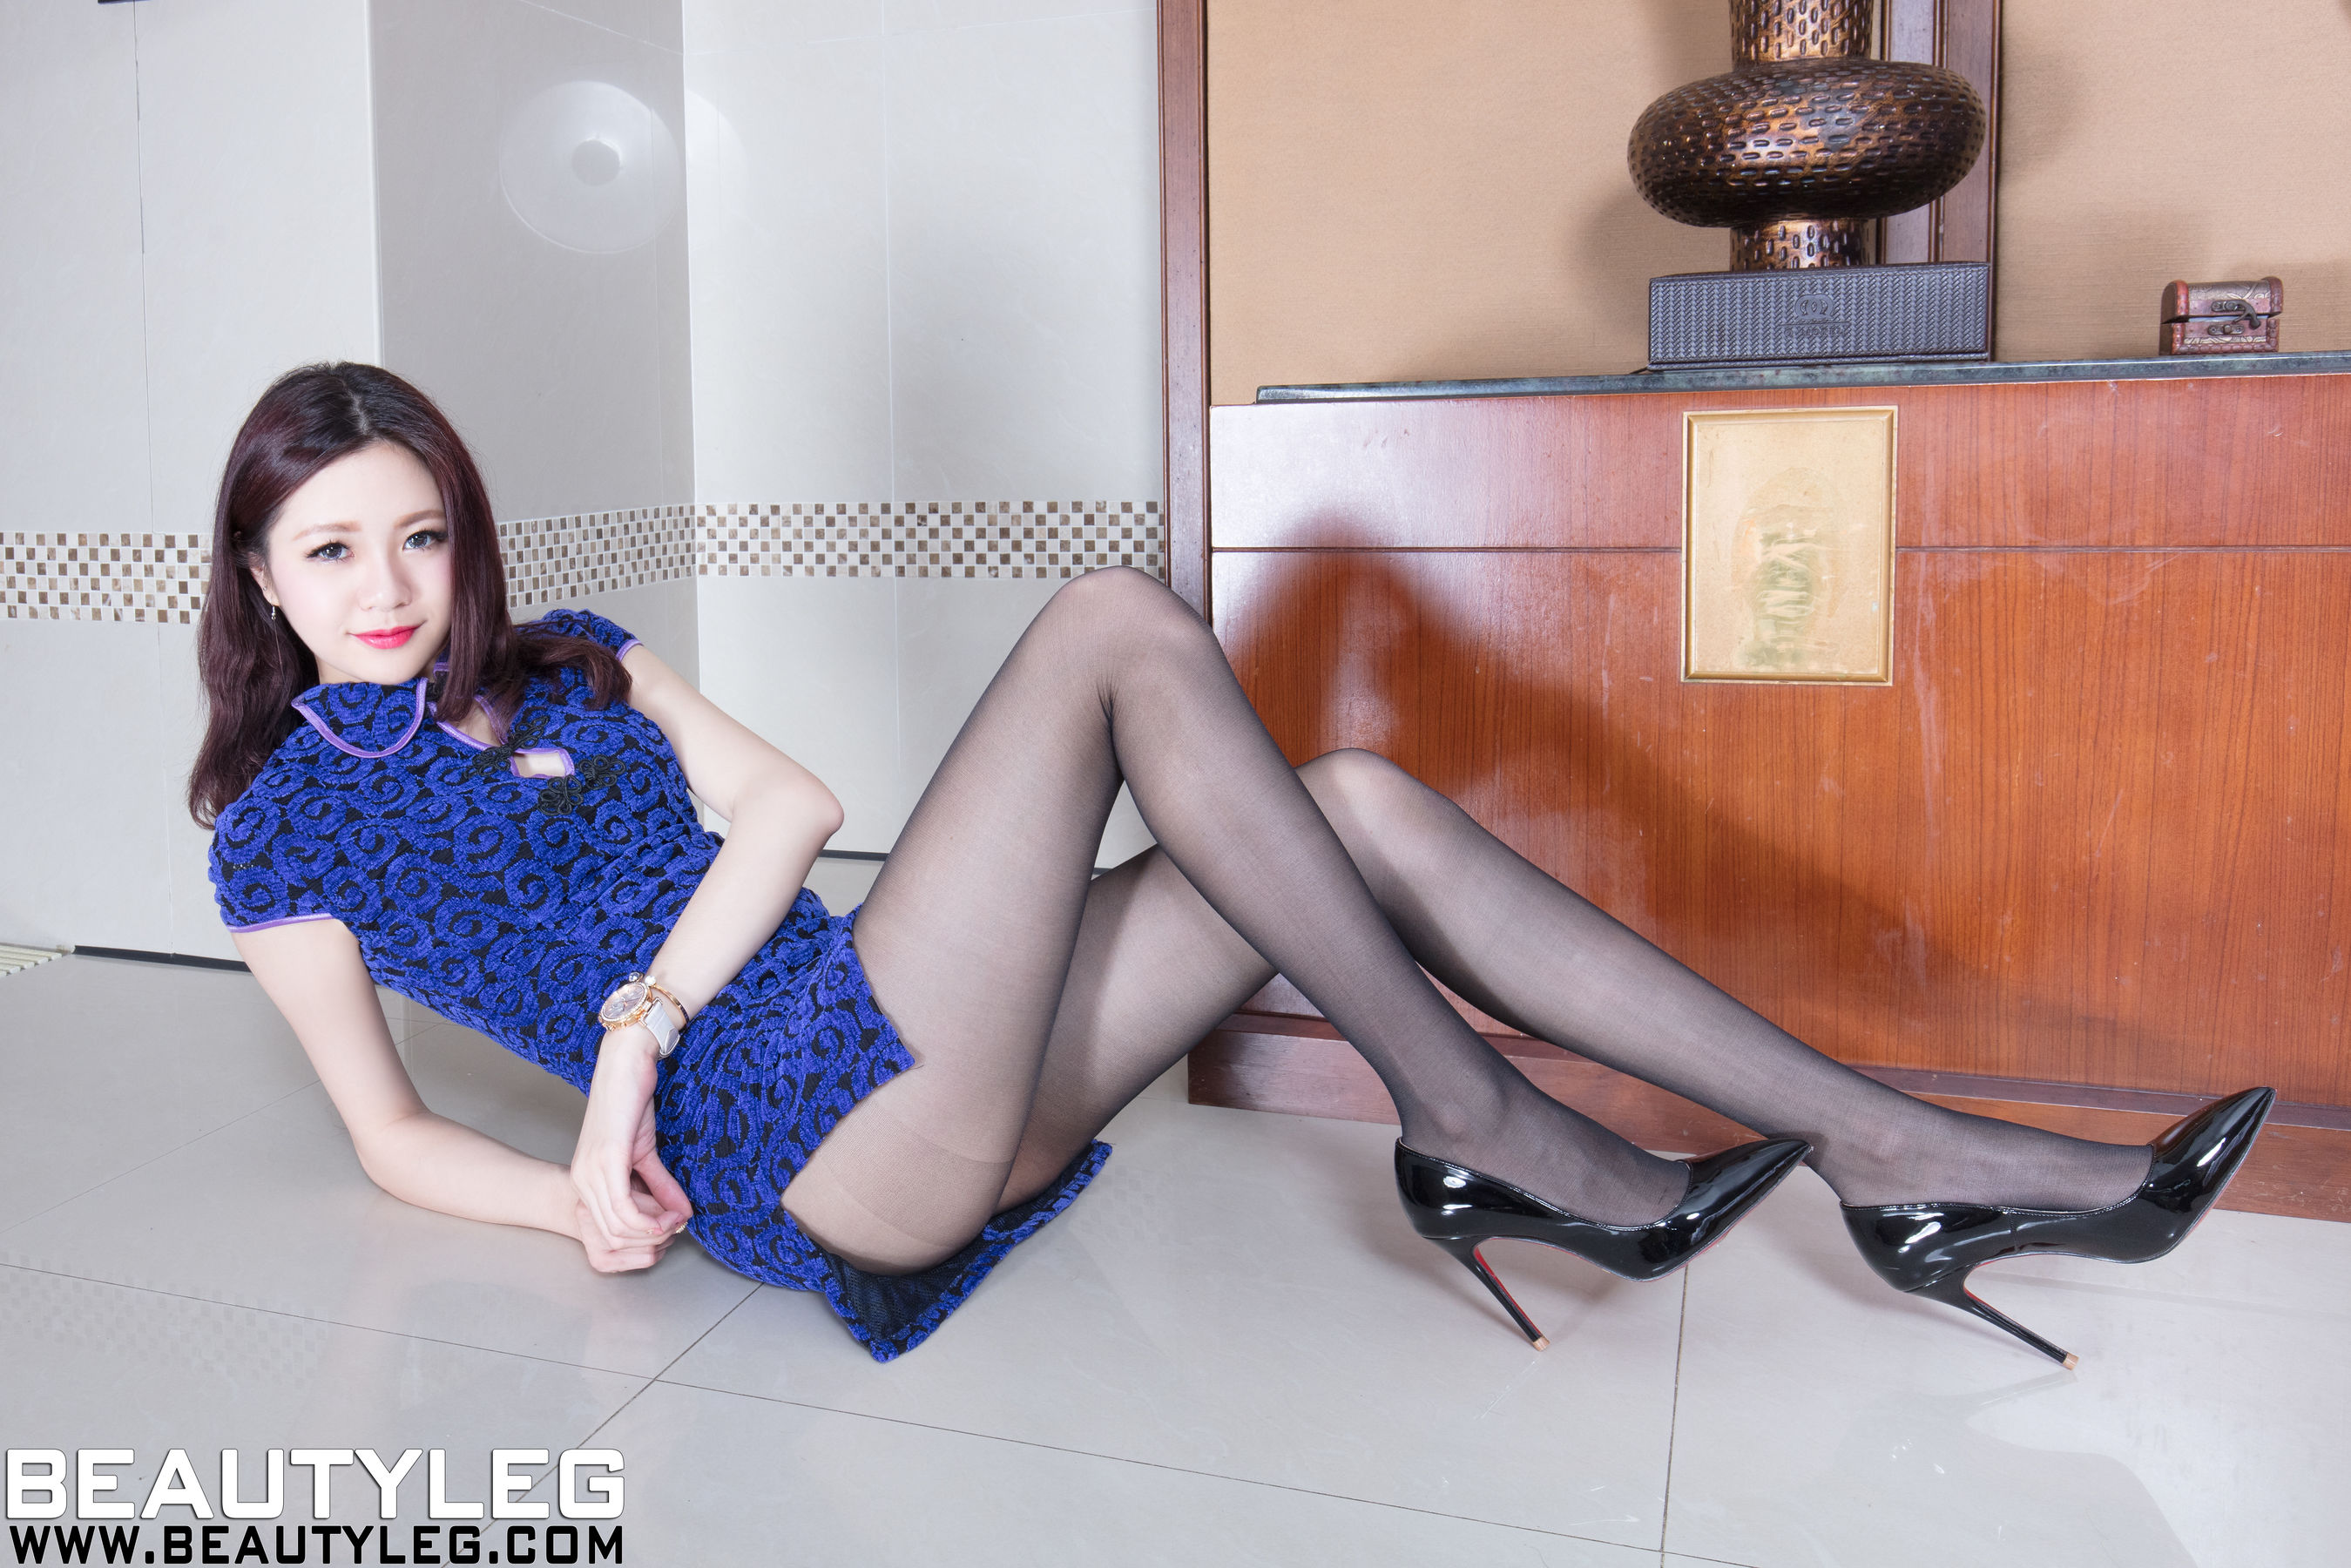 VOL.70 [Beautyleg]高跟长腿美女:腿模Una(Beautyleg Una)超高清个人性感漂亮大图(41P)